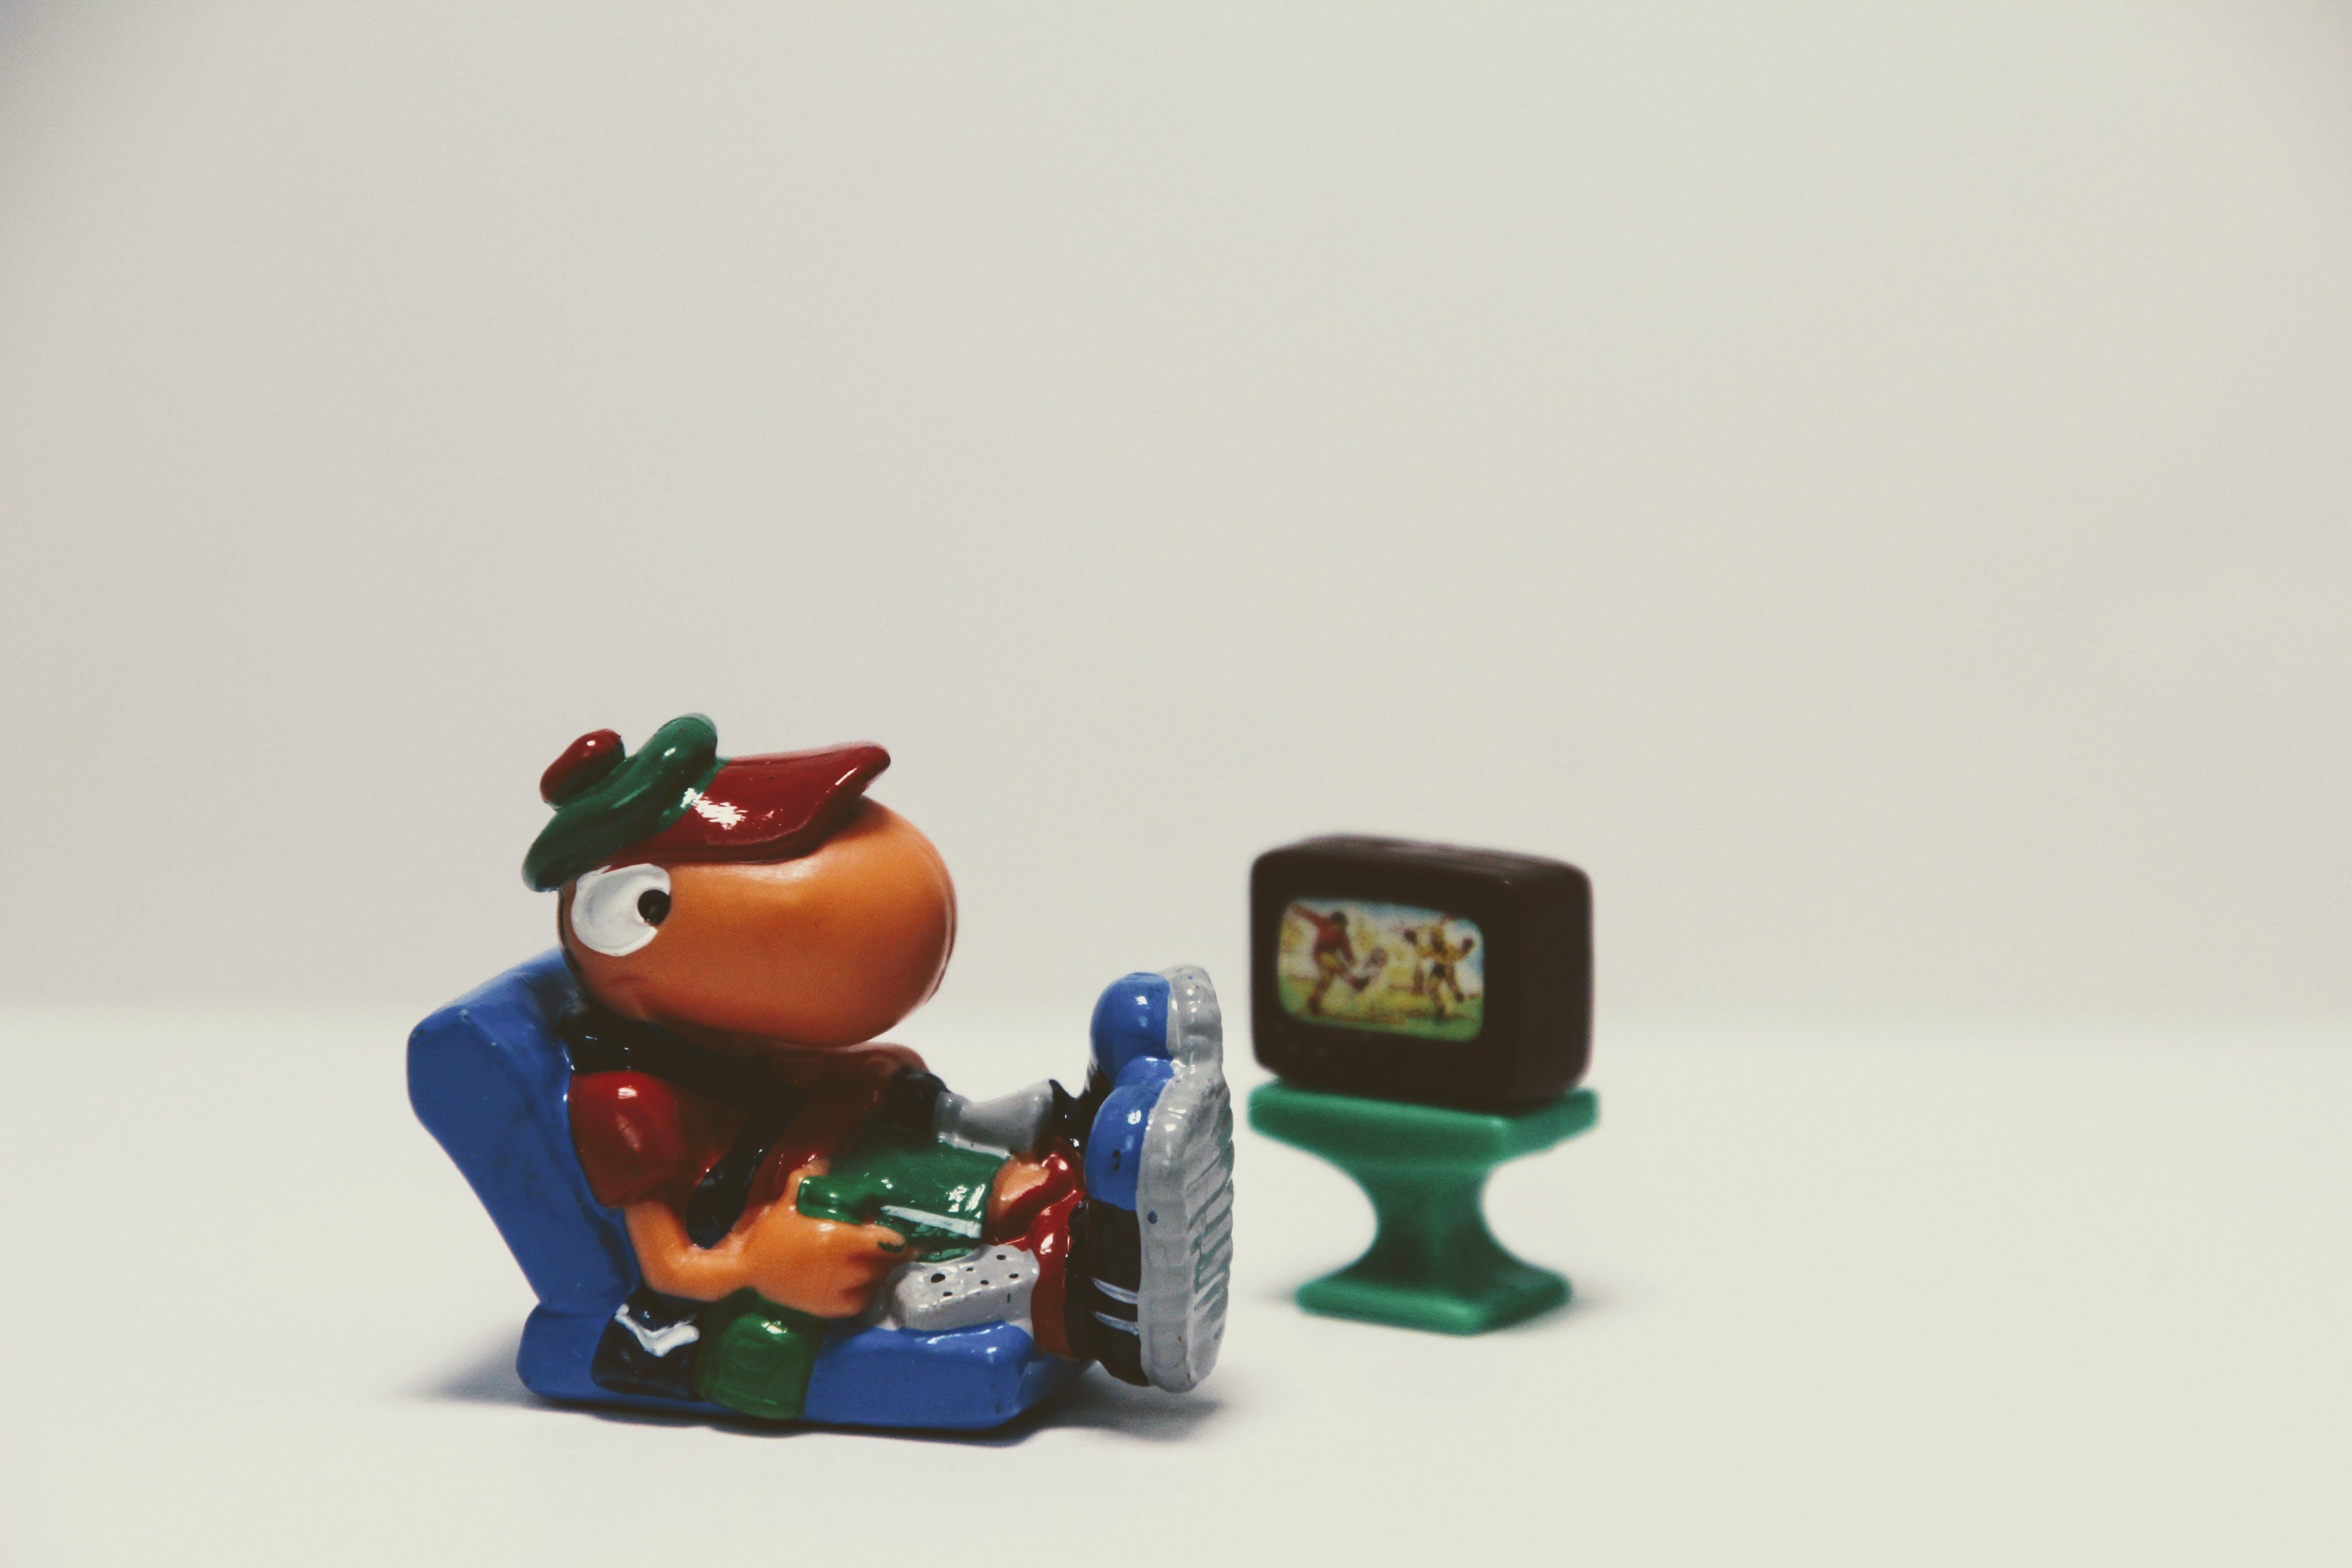 Free stock photo of sport, football, figure, toys